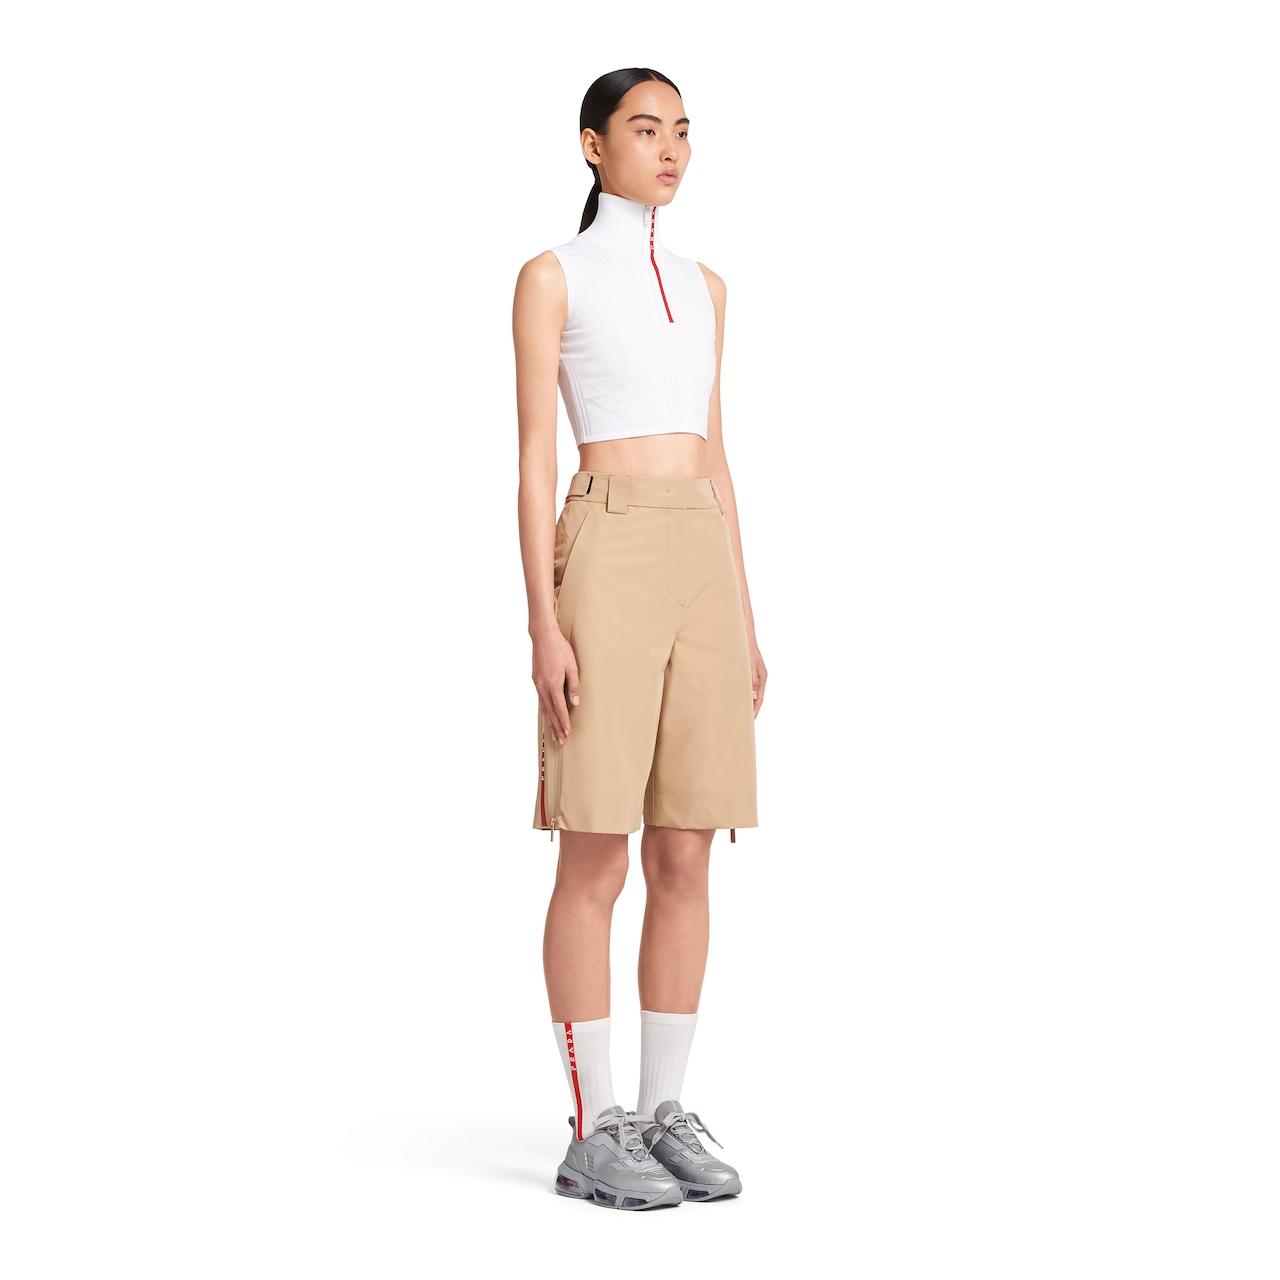 Prada LR-MX020 织物百慕大短裤 3